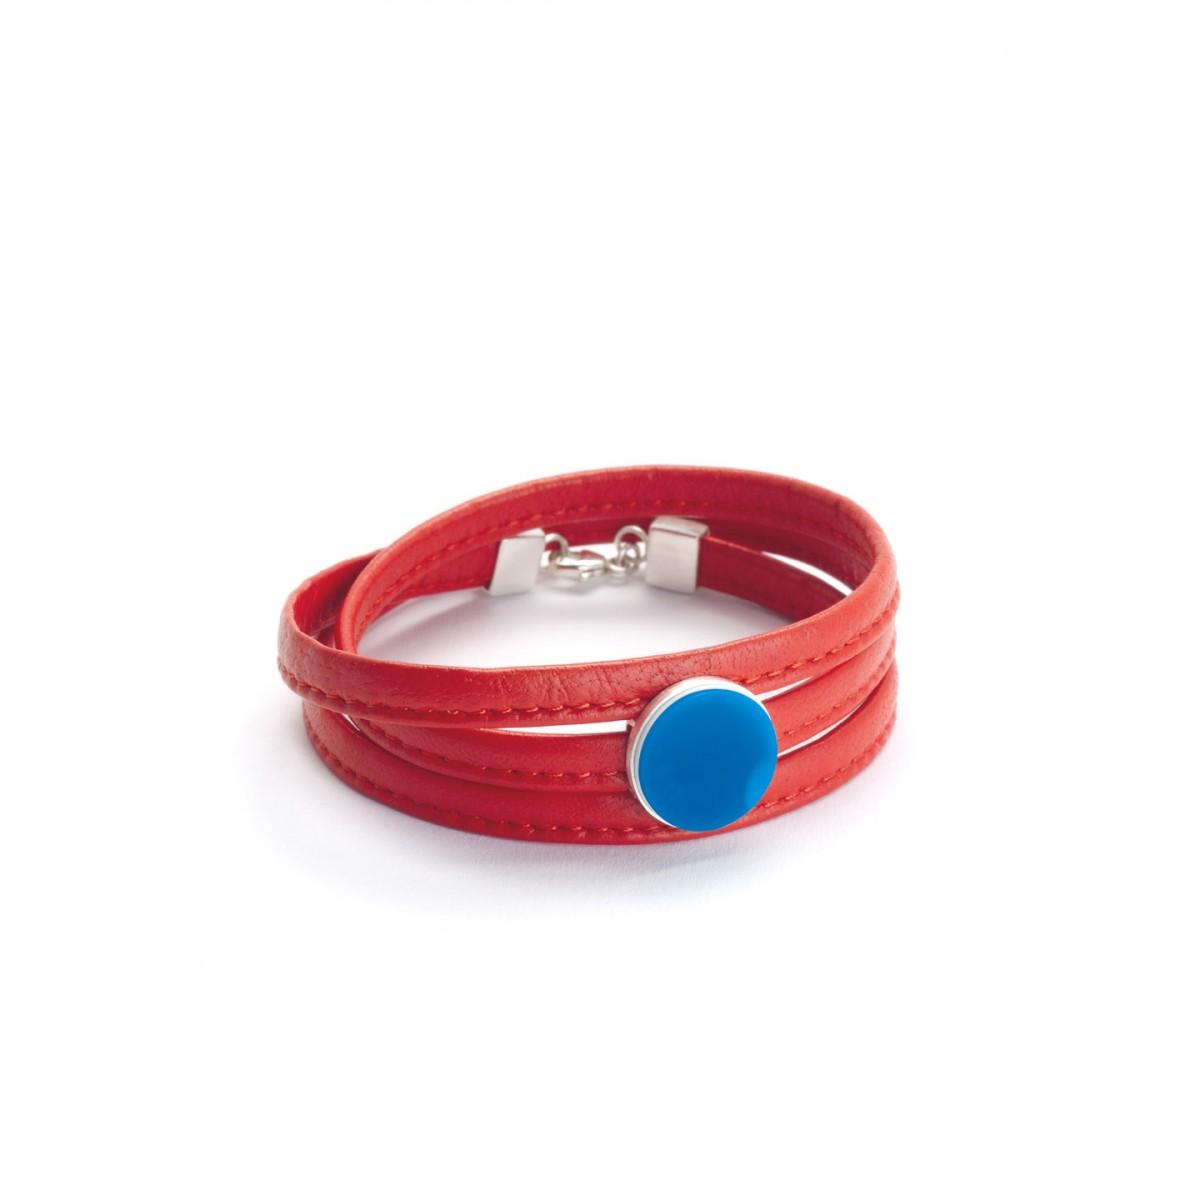 "Eva Slotta Jewellery ""Tint Deep"" Armband mit rotem Nappaleder  und blauem Achat, 925 Silber"